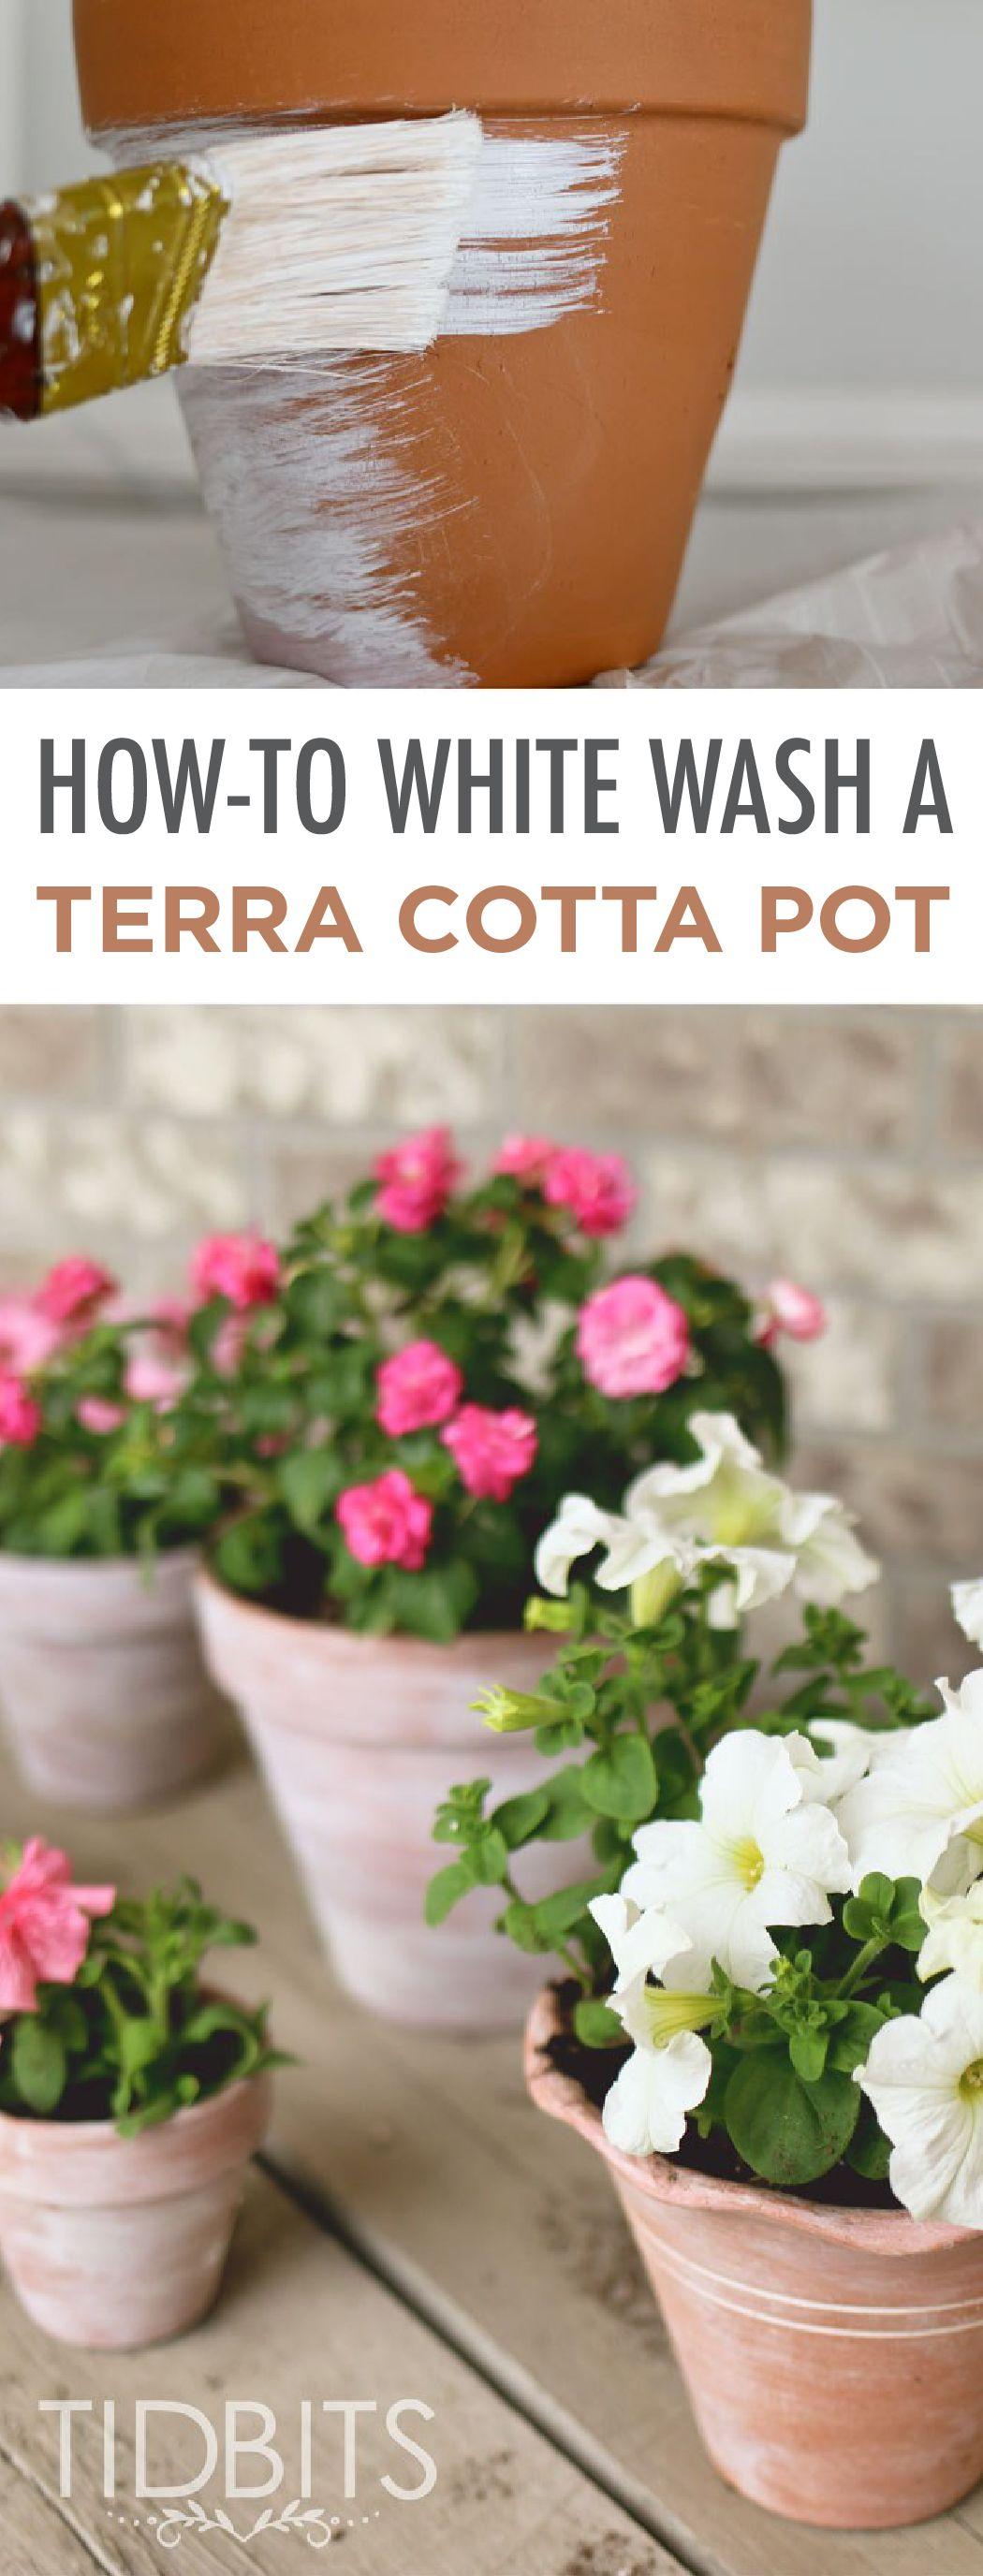 Blogger Tidbits shows you how to whitewash terracotta